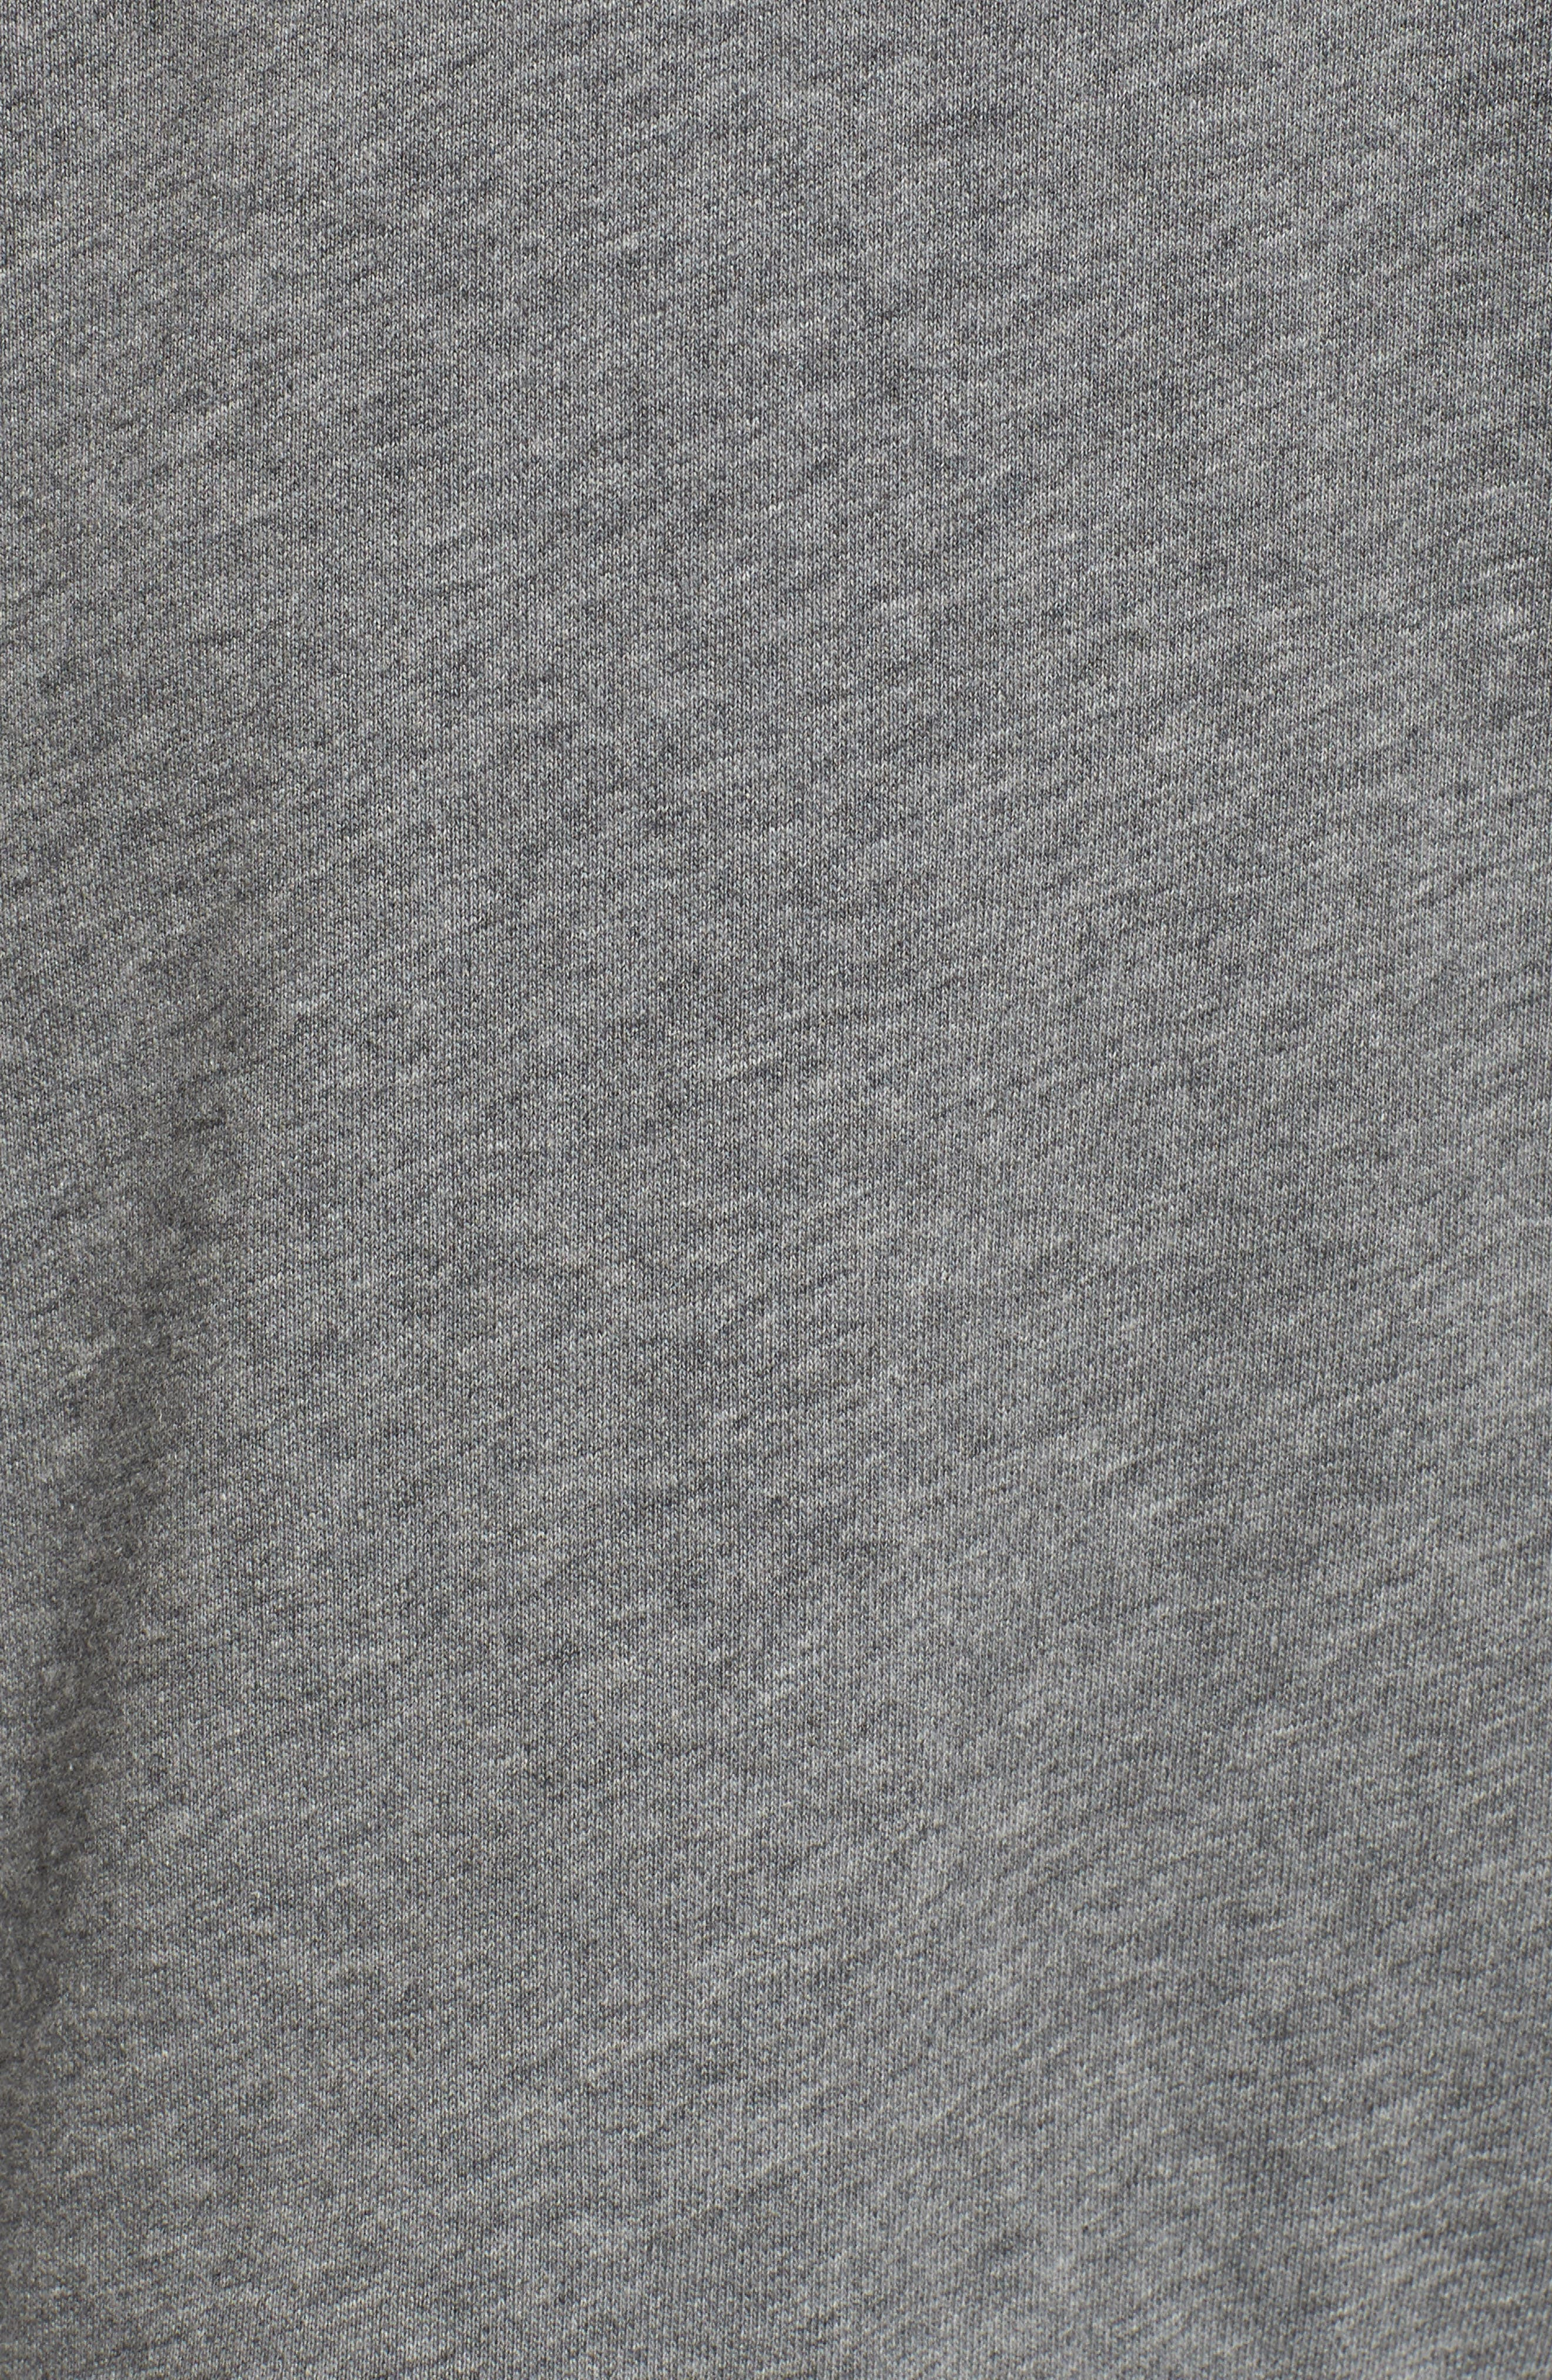 Ruffle Sweatshirt,                             Alternate thumbnail 9, color,